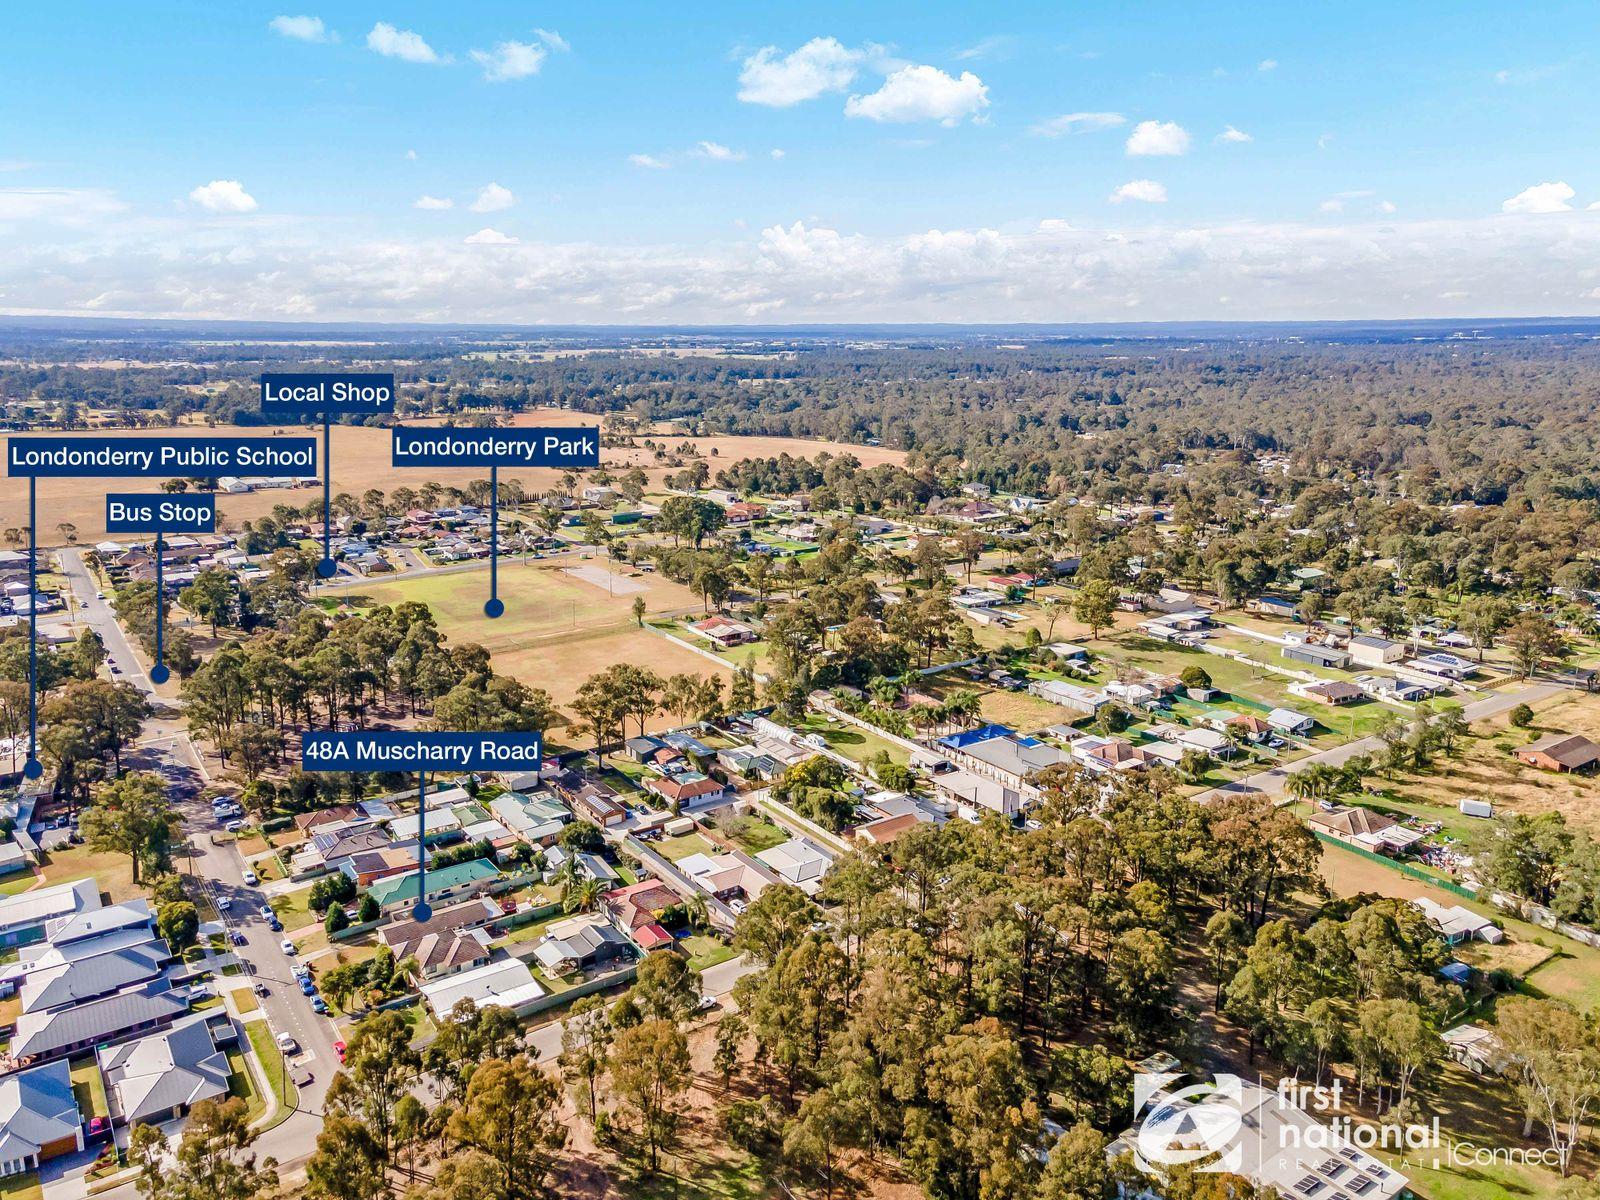 48a Muscharry Rd, Londonderry, NSW 2753